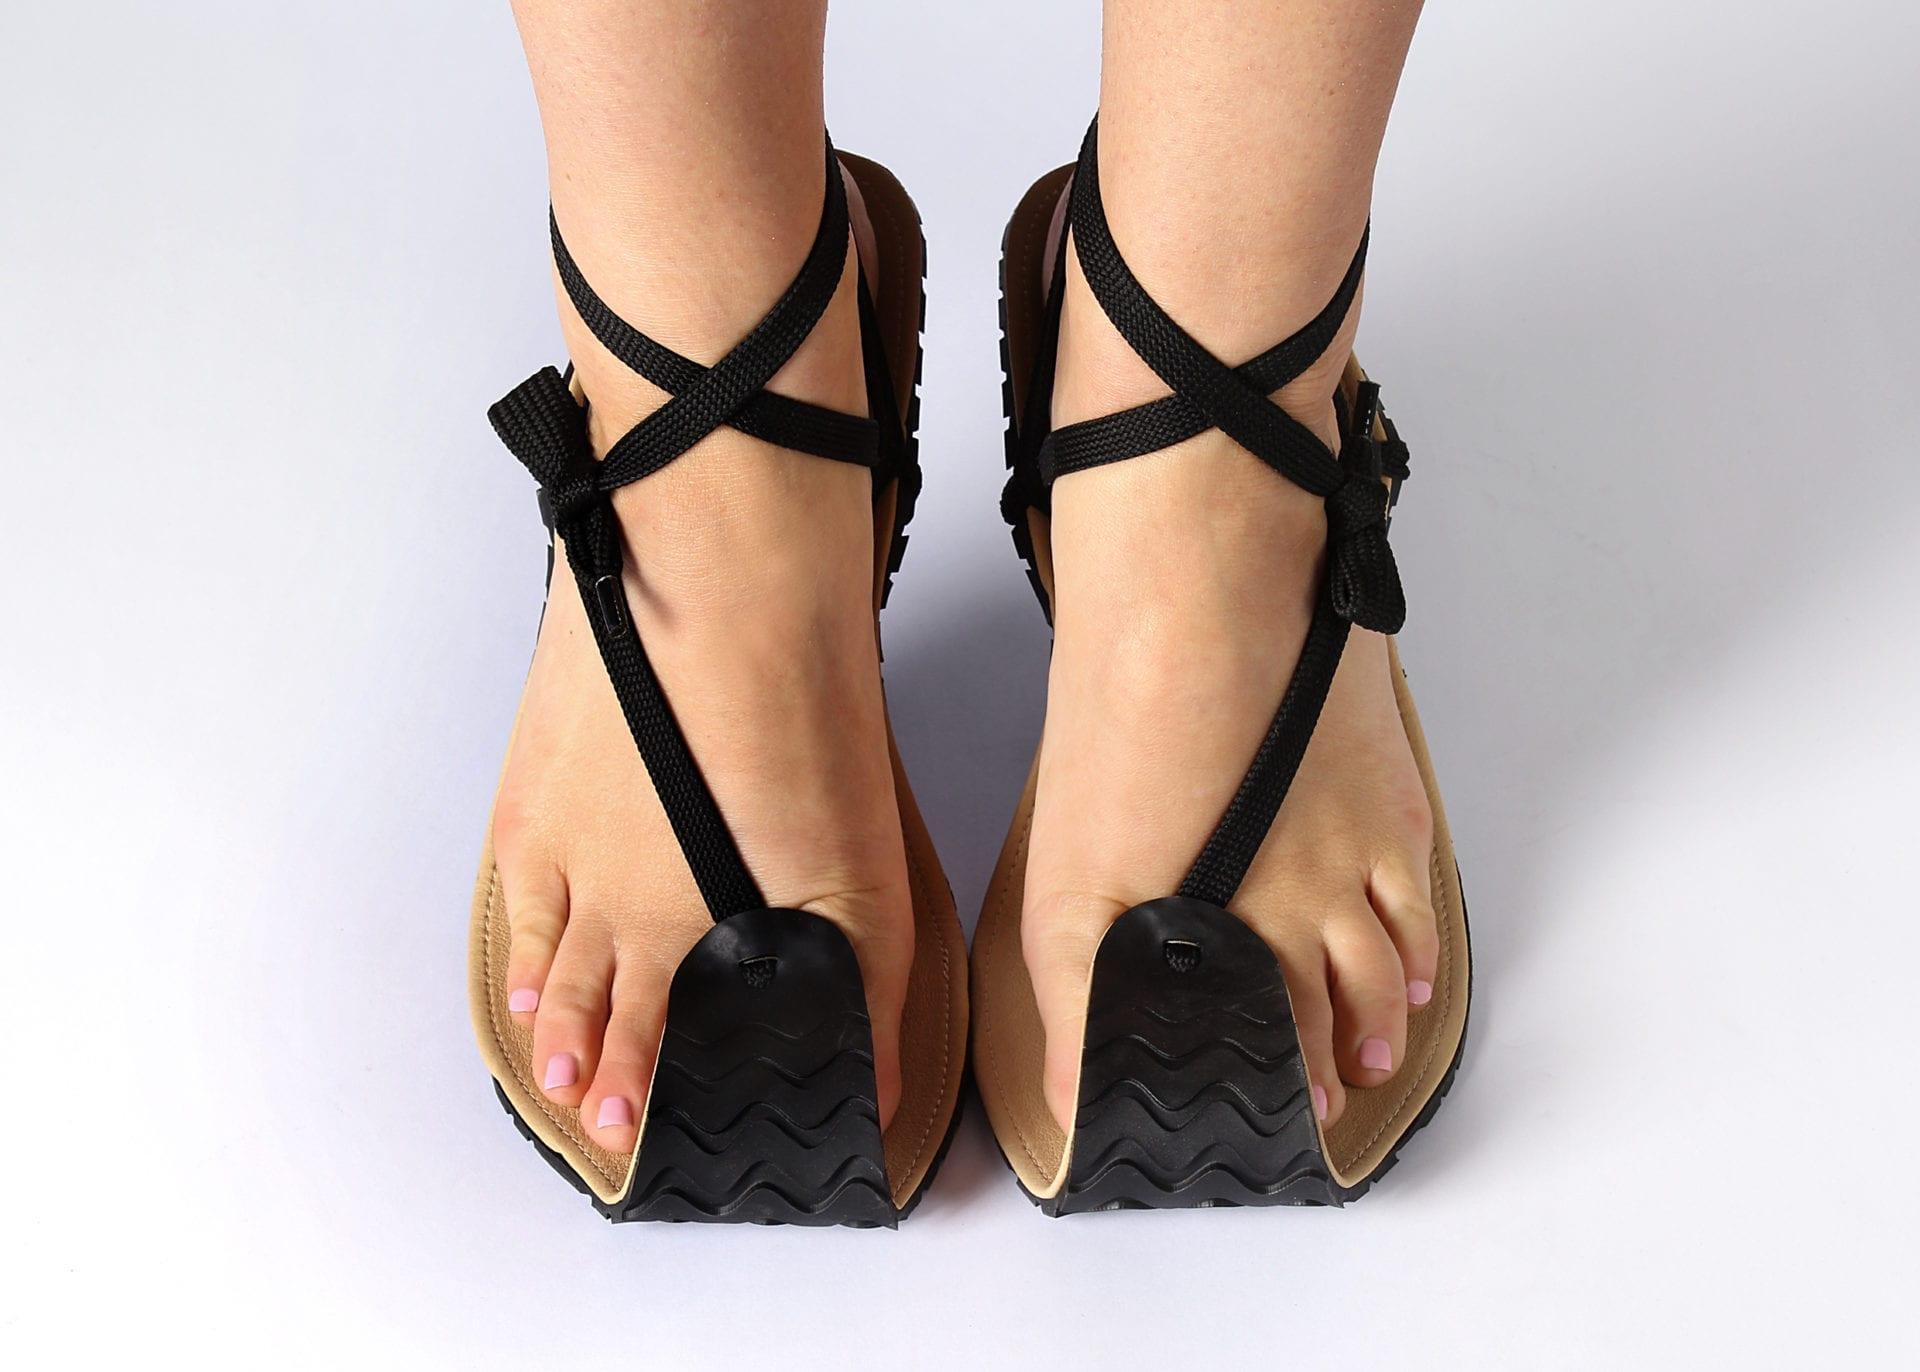 Magical Shoes CABALLO BLANCO- HUARACHE SANDALS picture 6